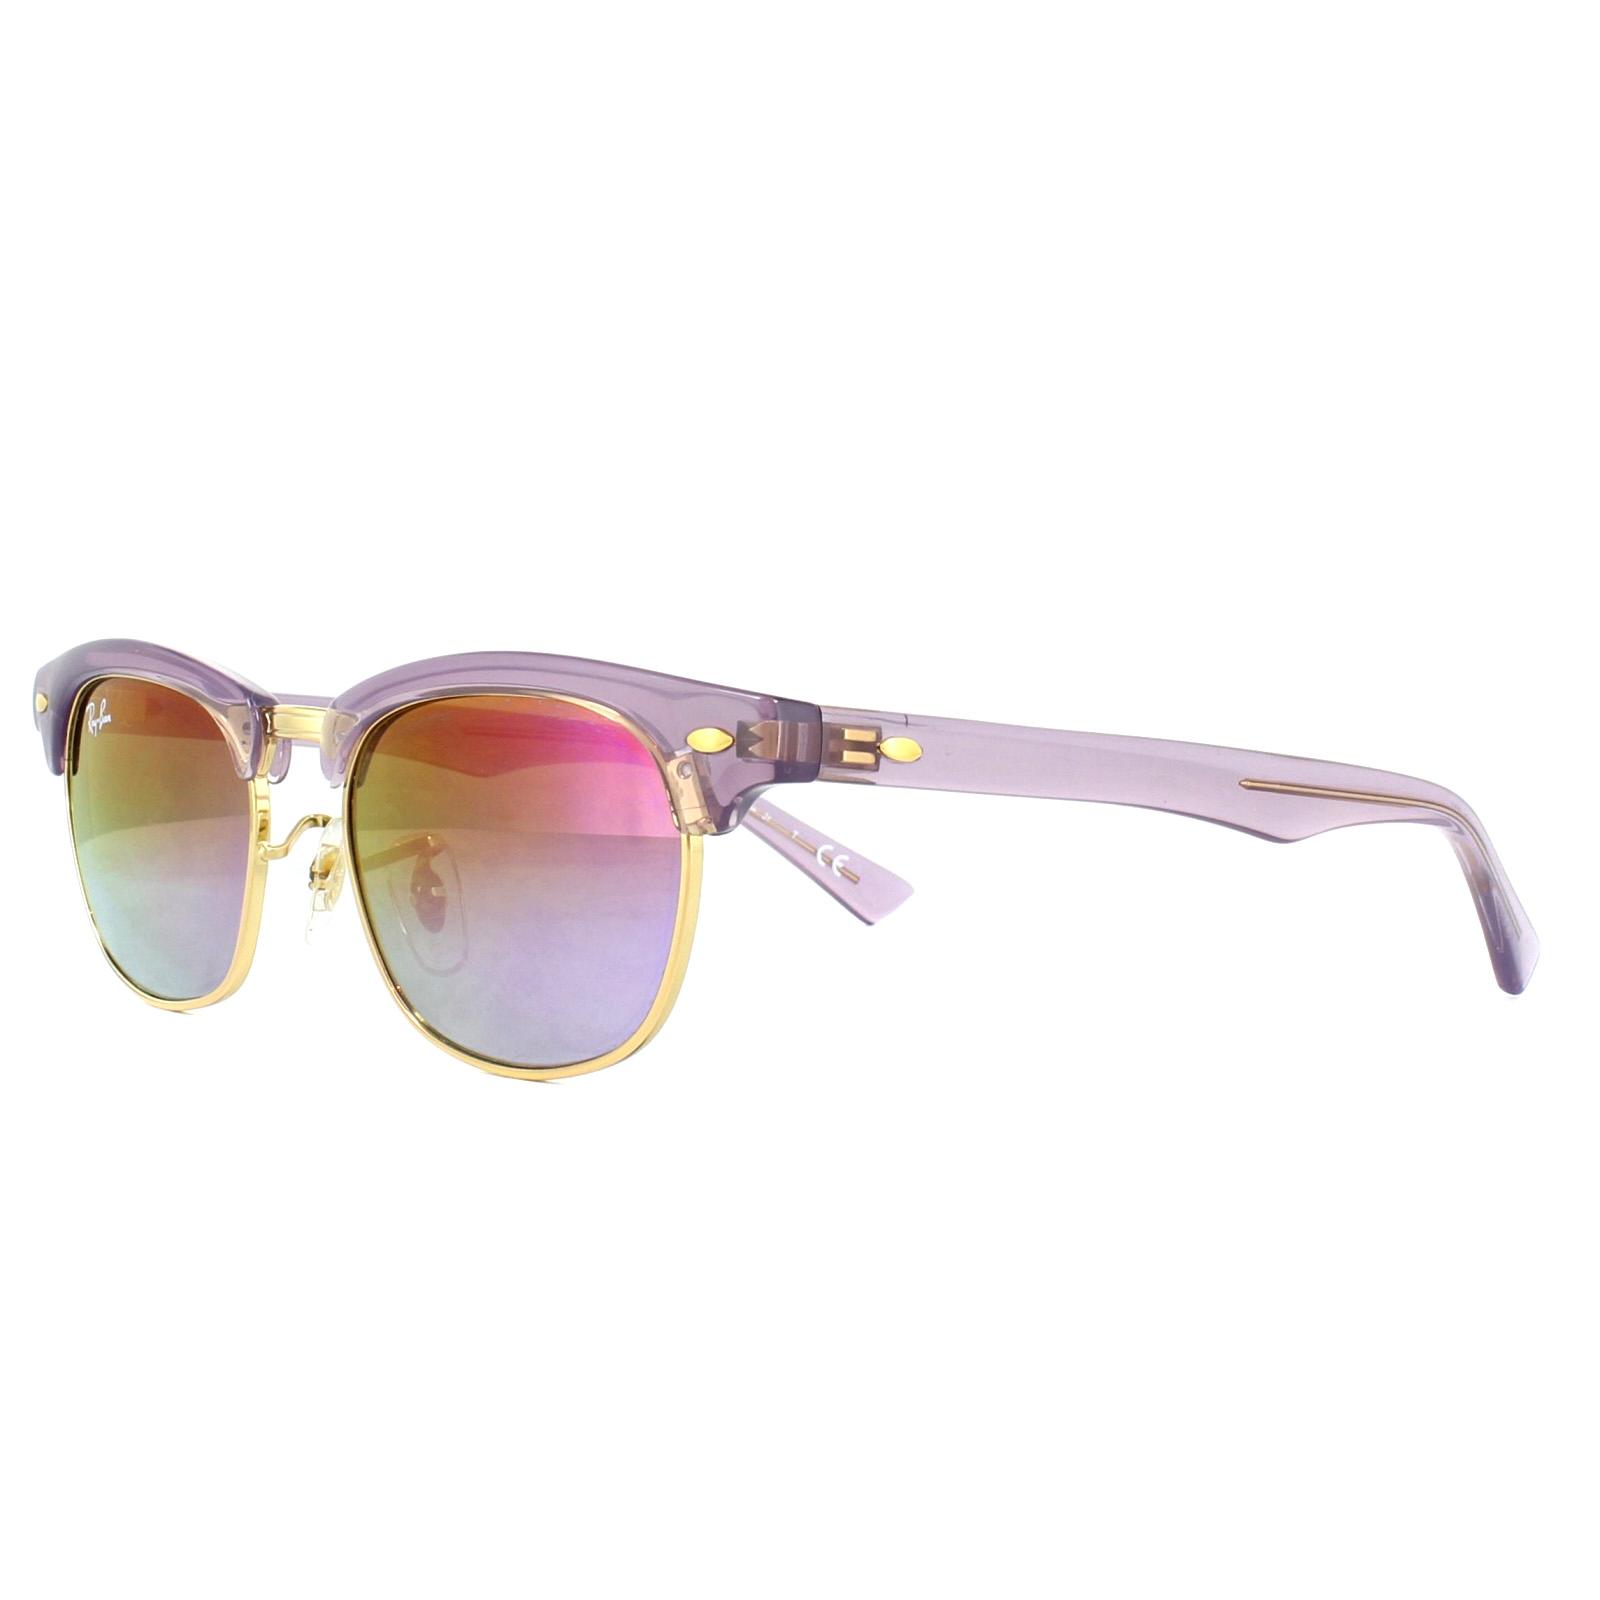 6d0cbdd401a Sentinel Ray-Ban Junior Sunglasses 9050S 7036A9 Violet Violet Gradient  Mirror 45mm